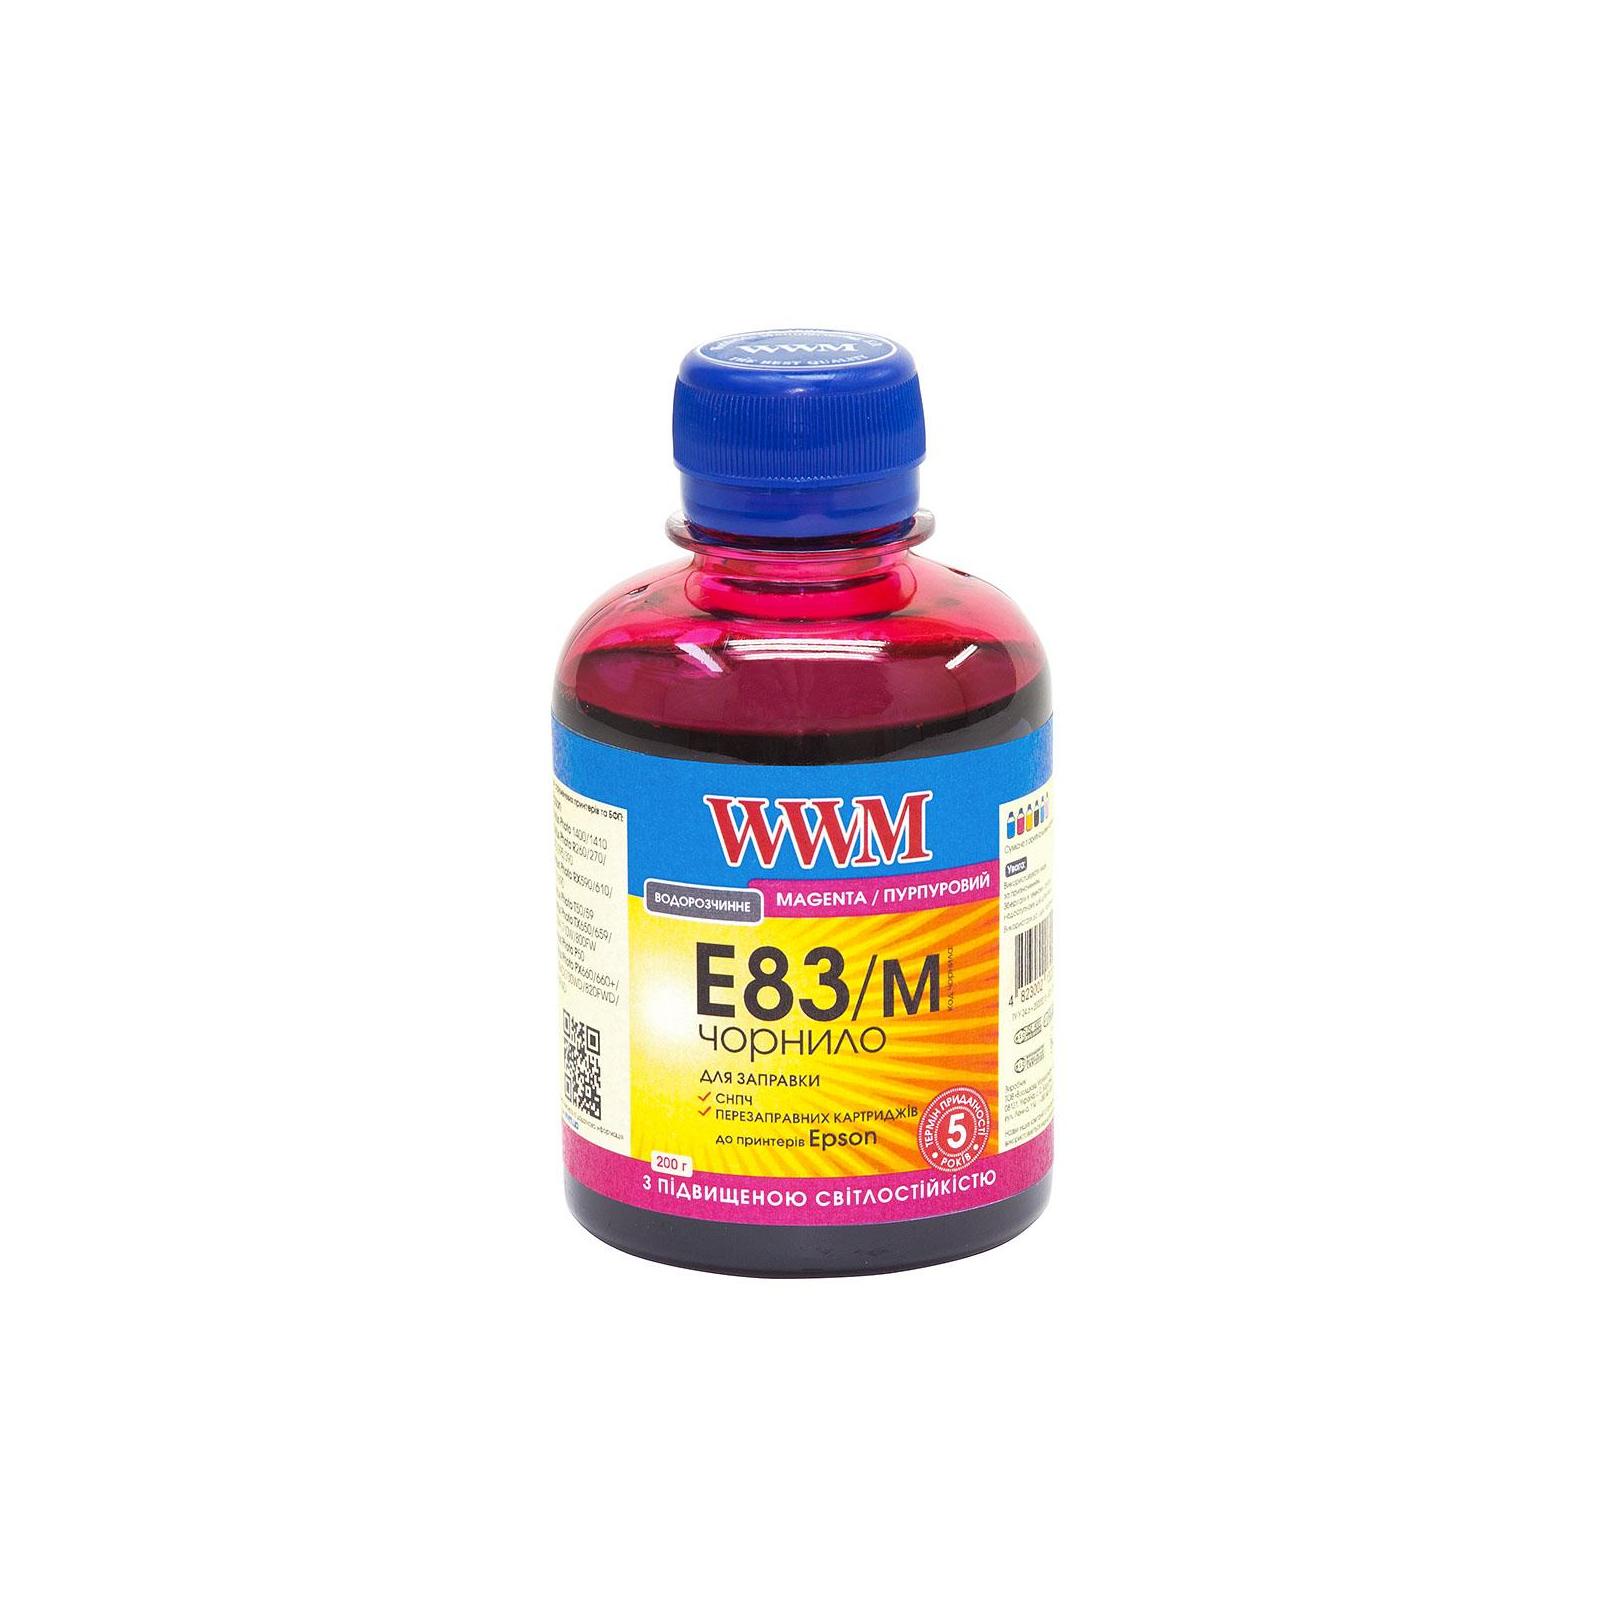 Чернила WWM EPSON StPhoto R270/290 Magenta /NEW (E83/M)